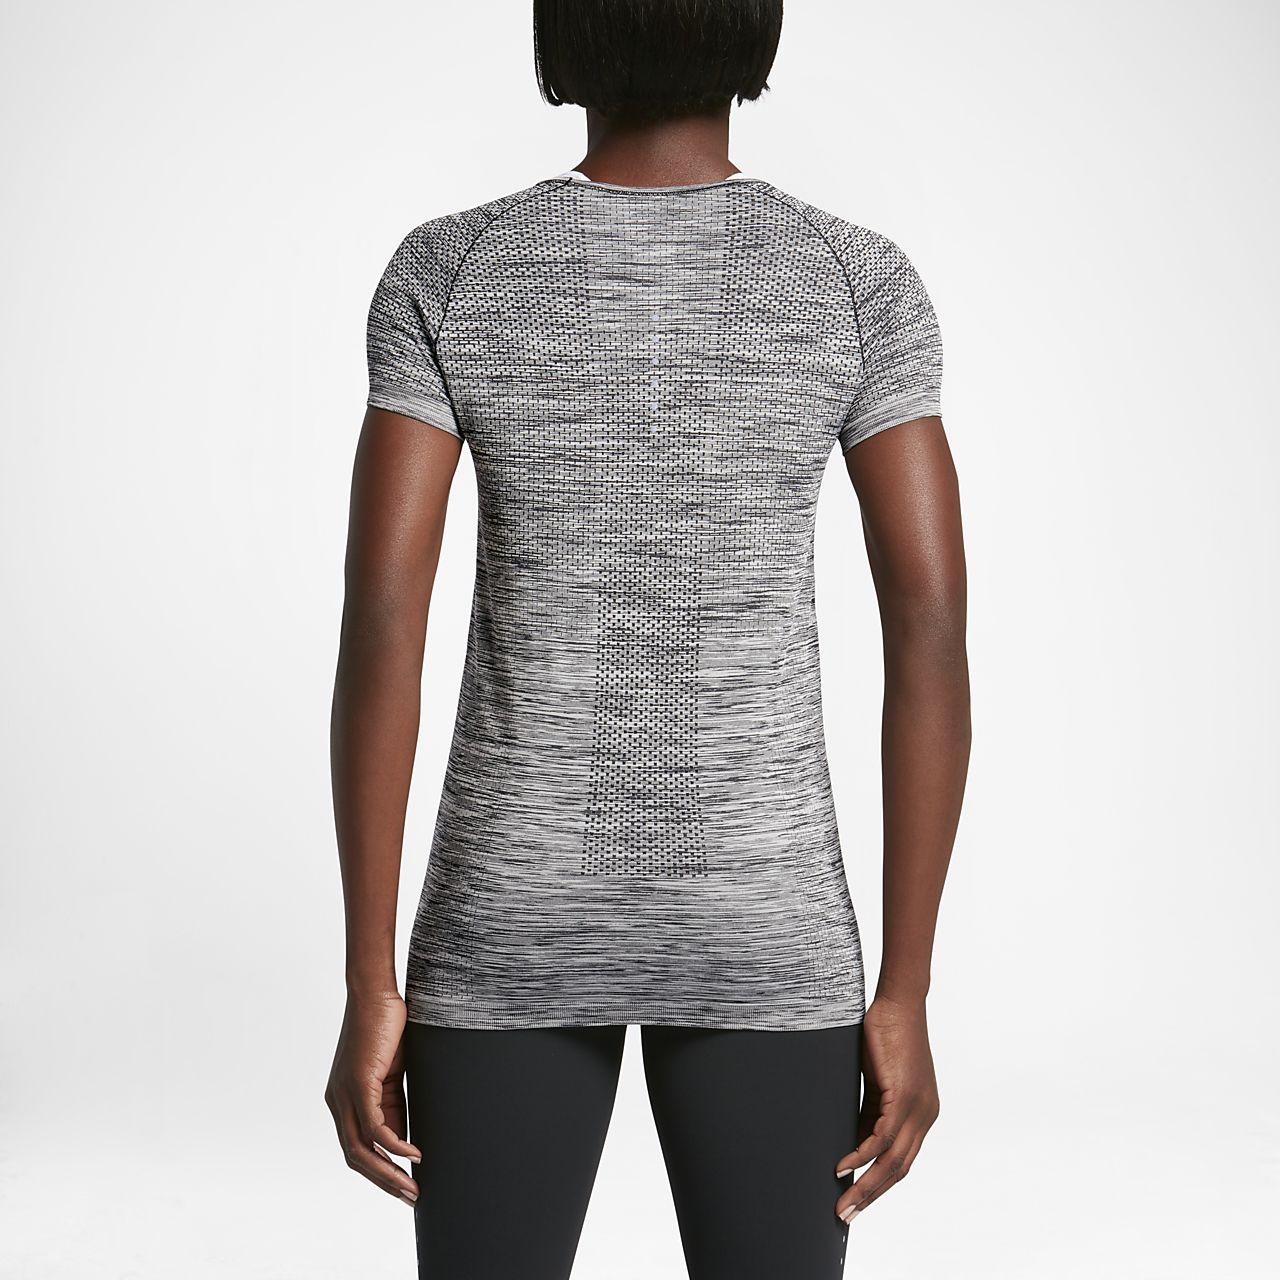 0cf0d9f7607e Nike Dri-FIT Knit Women s Short-Sleeve Running Top. Nike.com GB